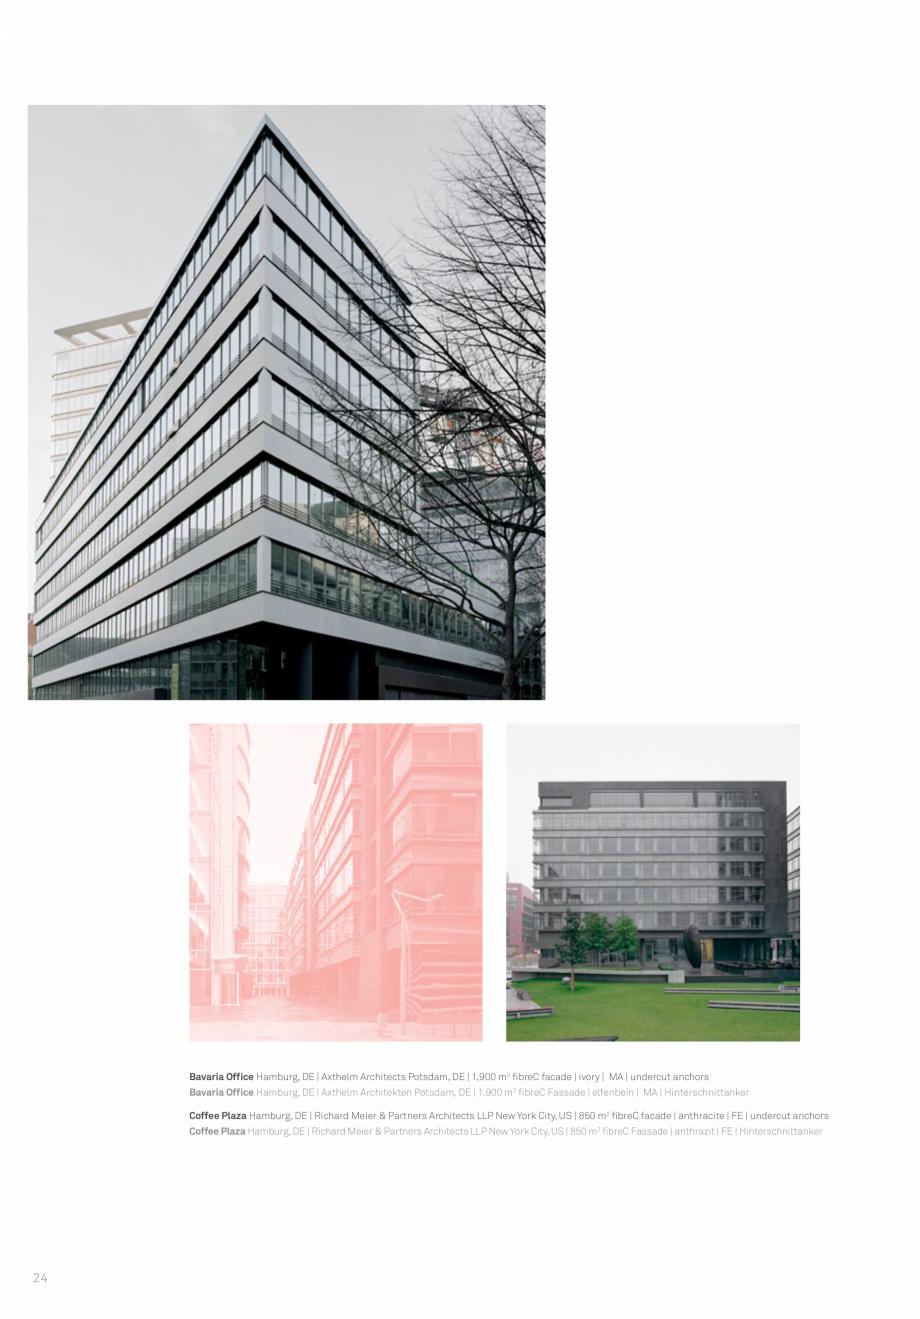 Pagina 26 - Panouri din beton aparent RIEDER Concrete Skin Lucrari, proiecte Engleza  München, DE |...